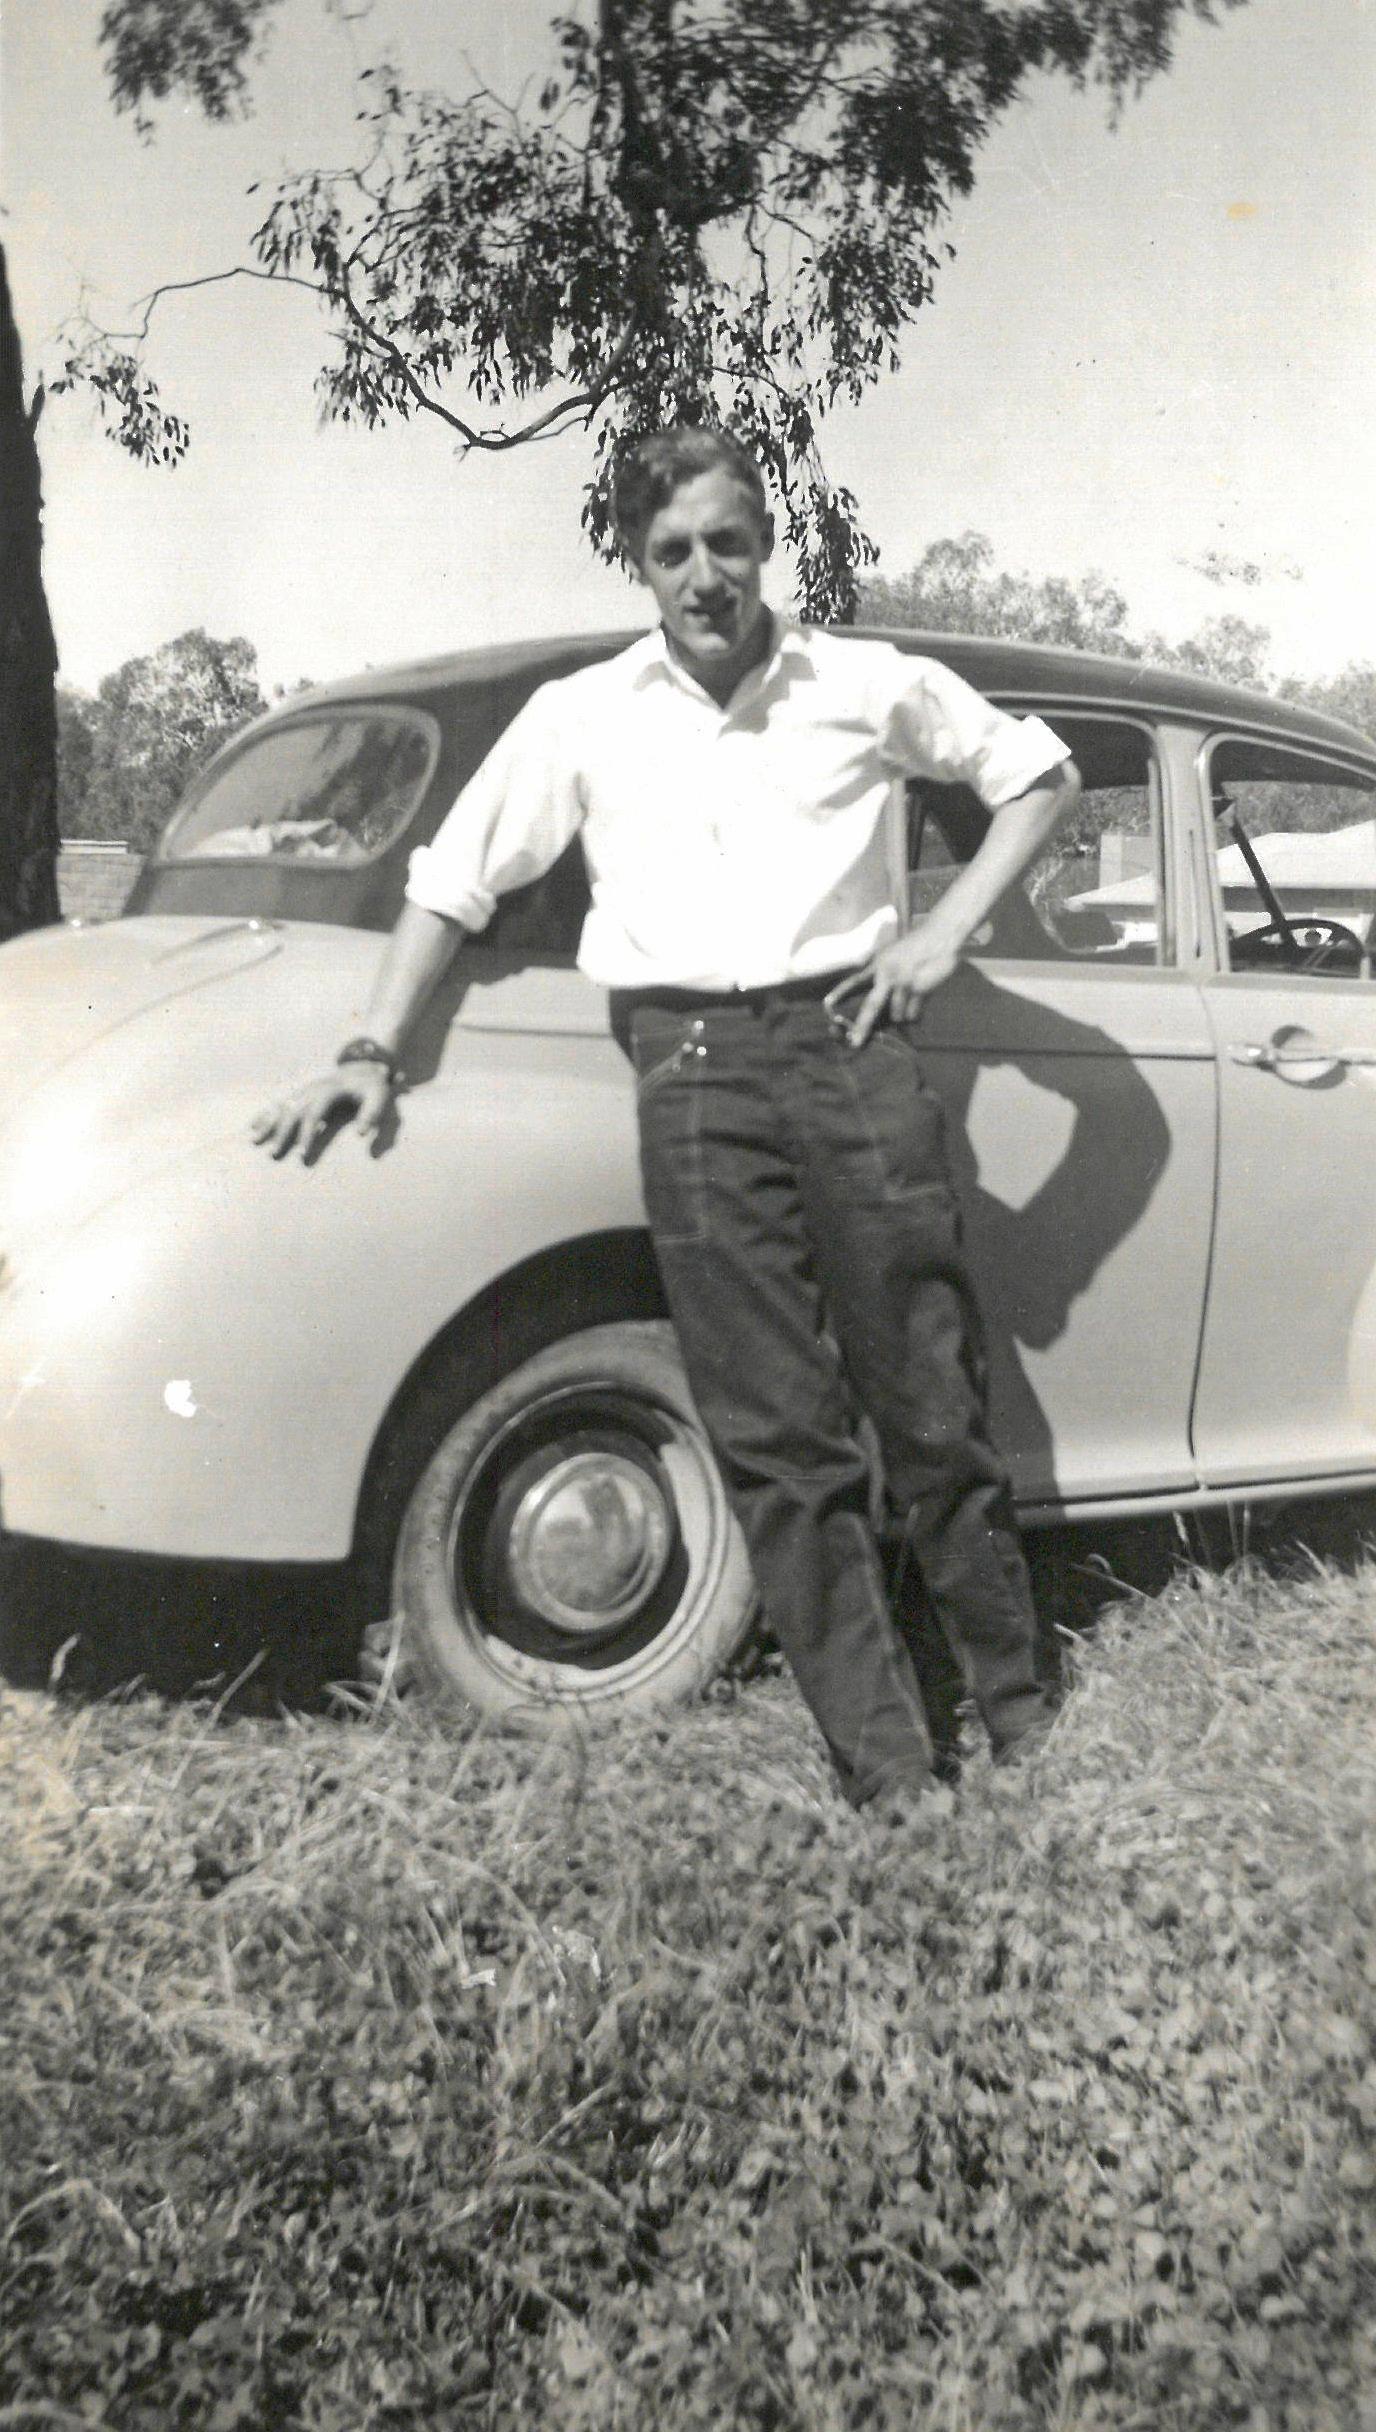 Dick van Tricht as a young man.